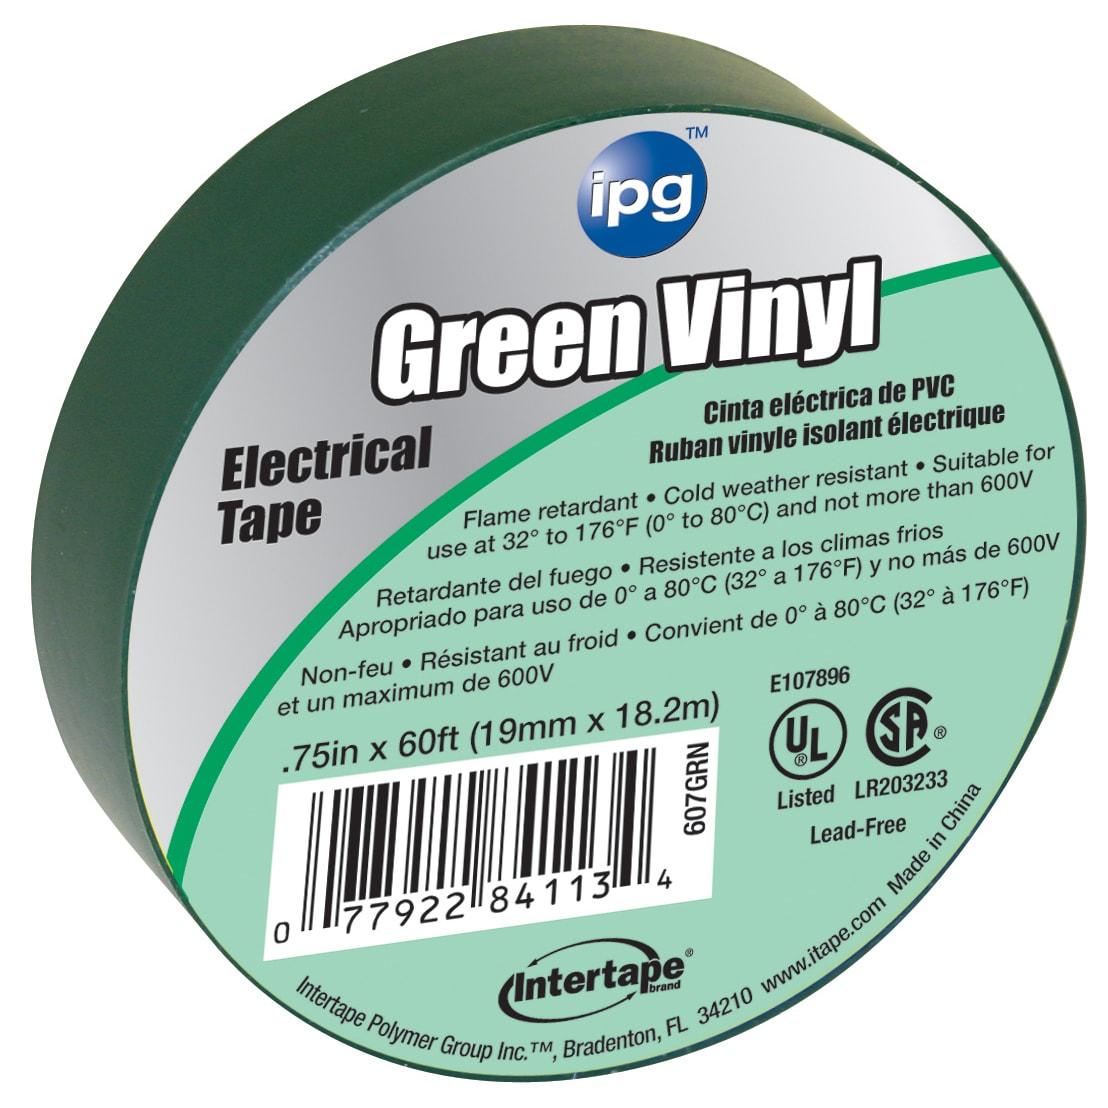 Intertape Polymer Group 85827 3/4 x 60 Green Vinyl Electrical Tape (Tape)